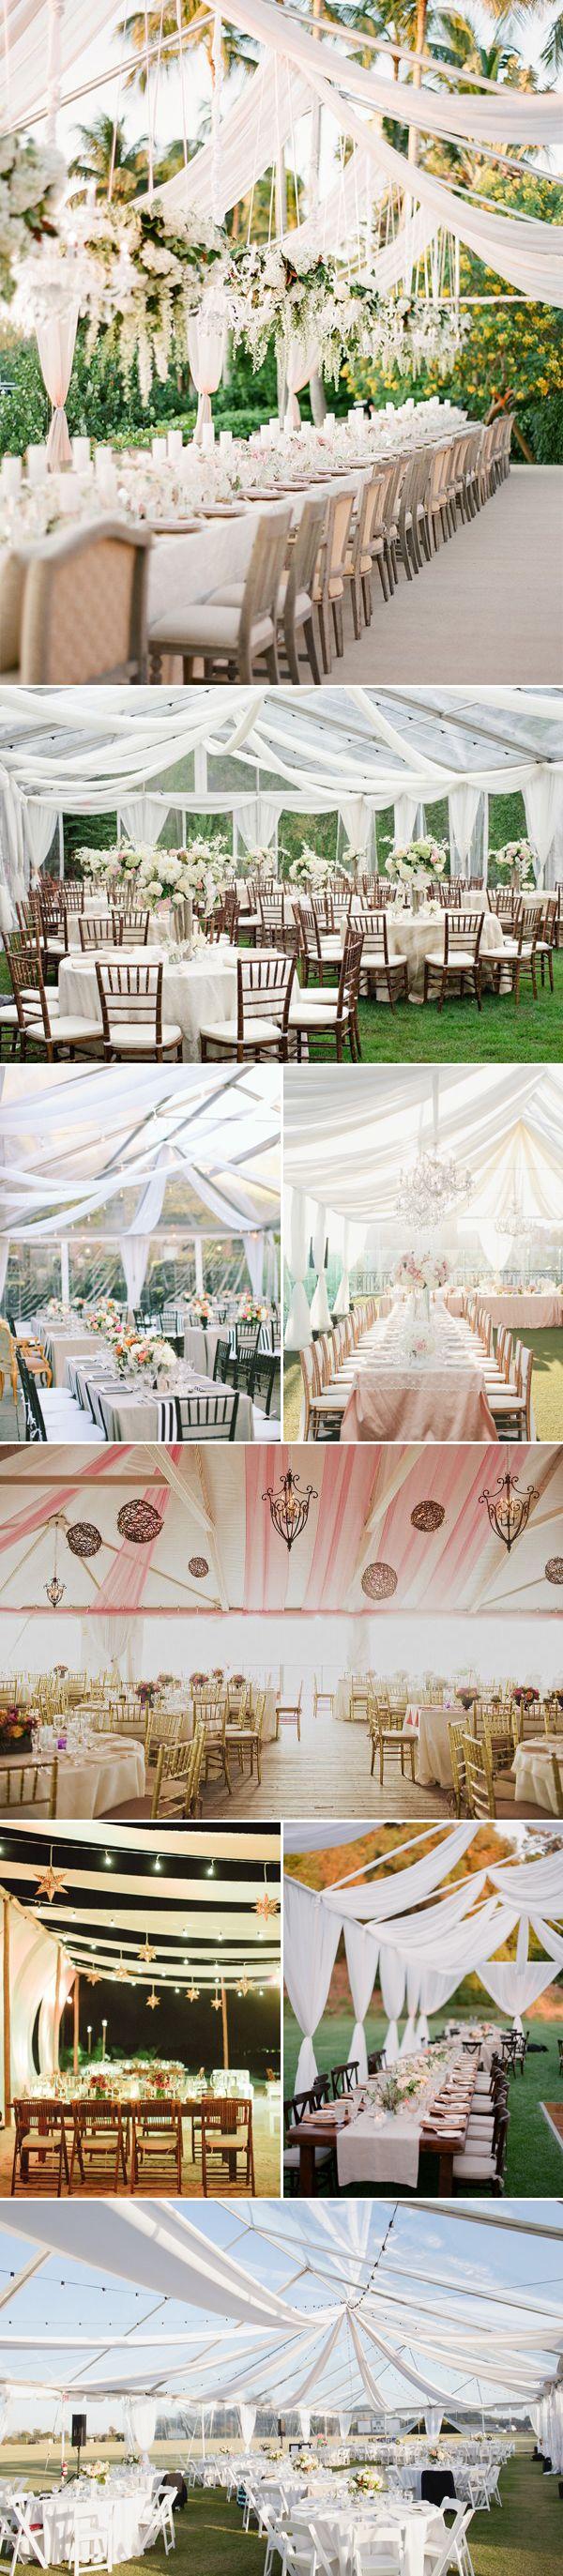 Wedding plans. Very excited!!  Wedding showers, weddings then babies. Yay!